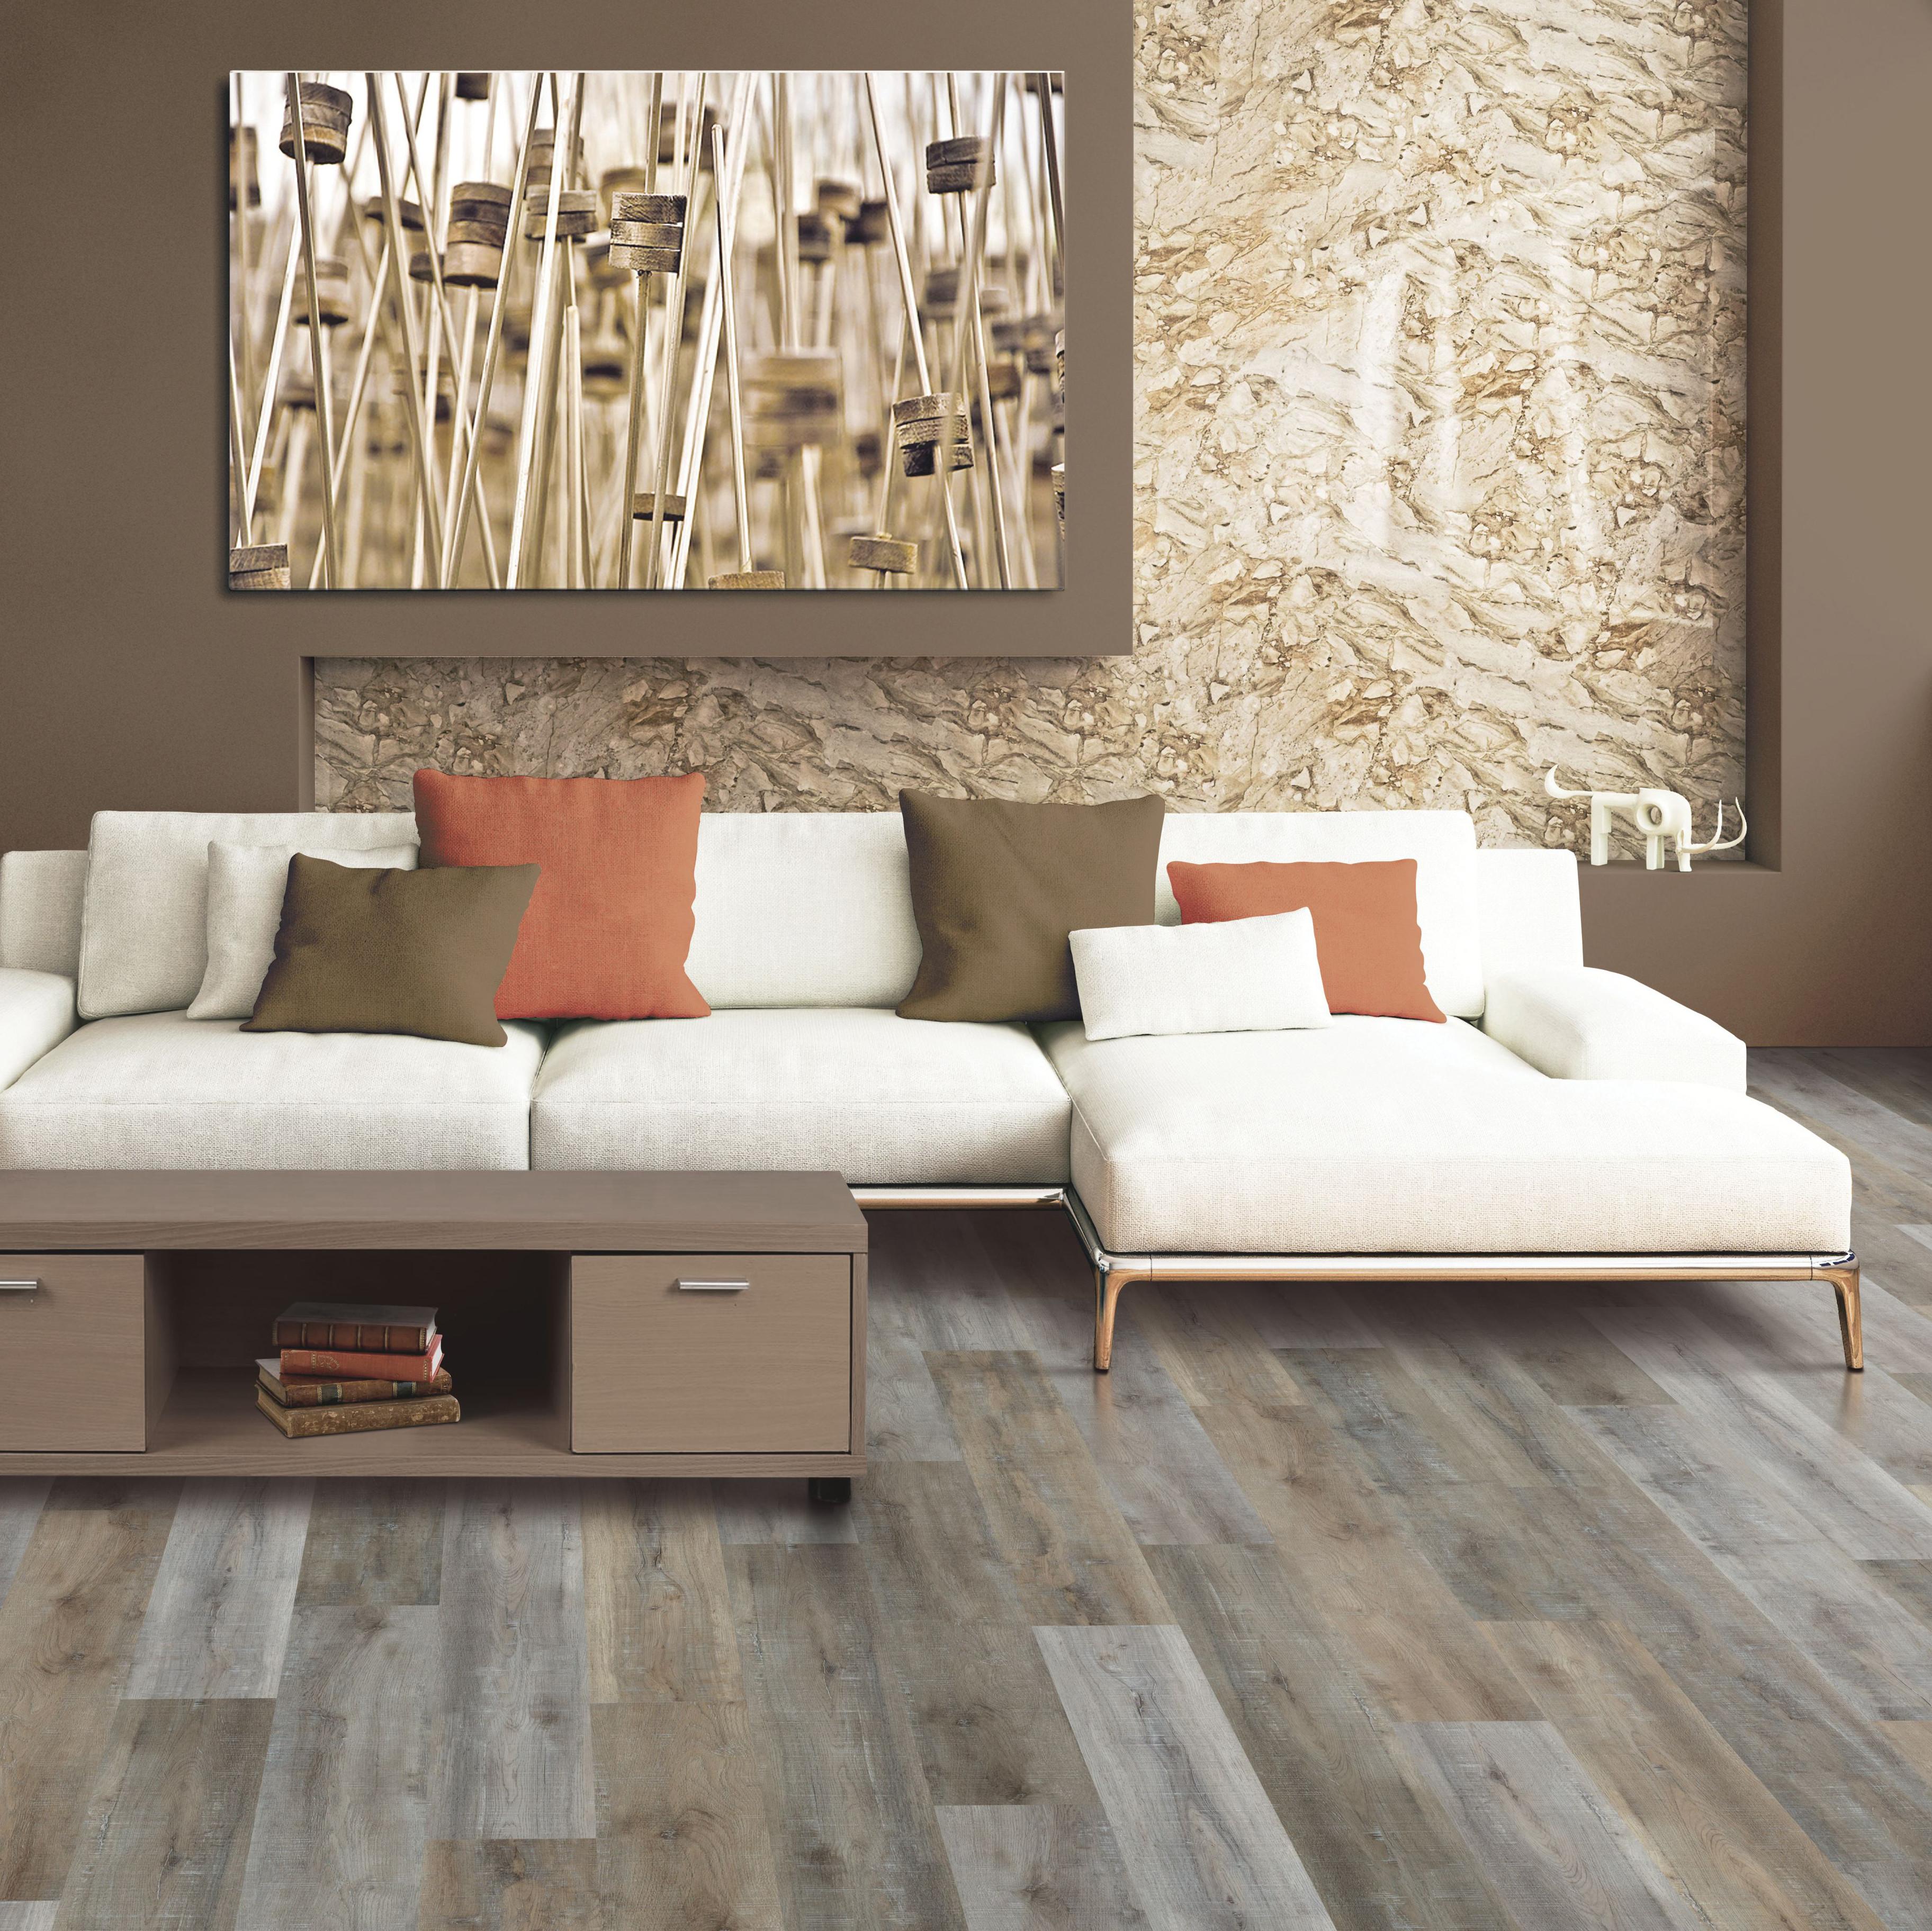 the hardwood floor store bolingbrook il of riterug flooringa carpet hardwood laminate columbus based within style spotlight gray flooring